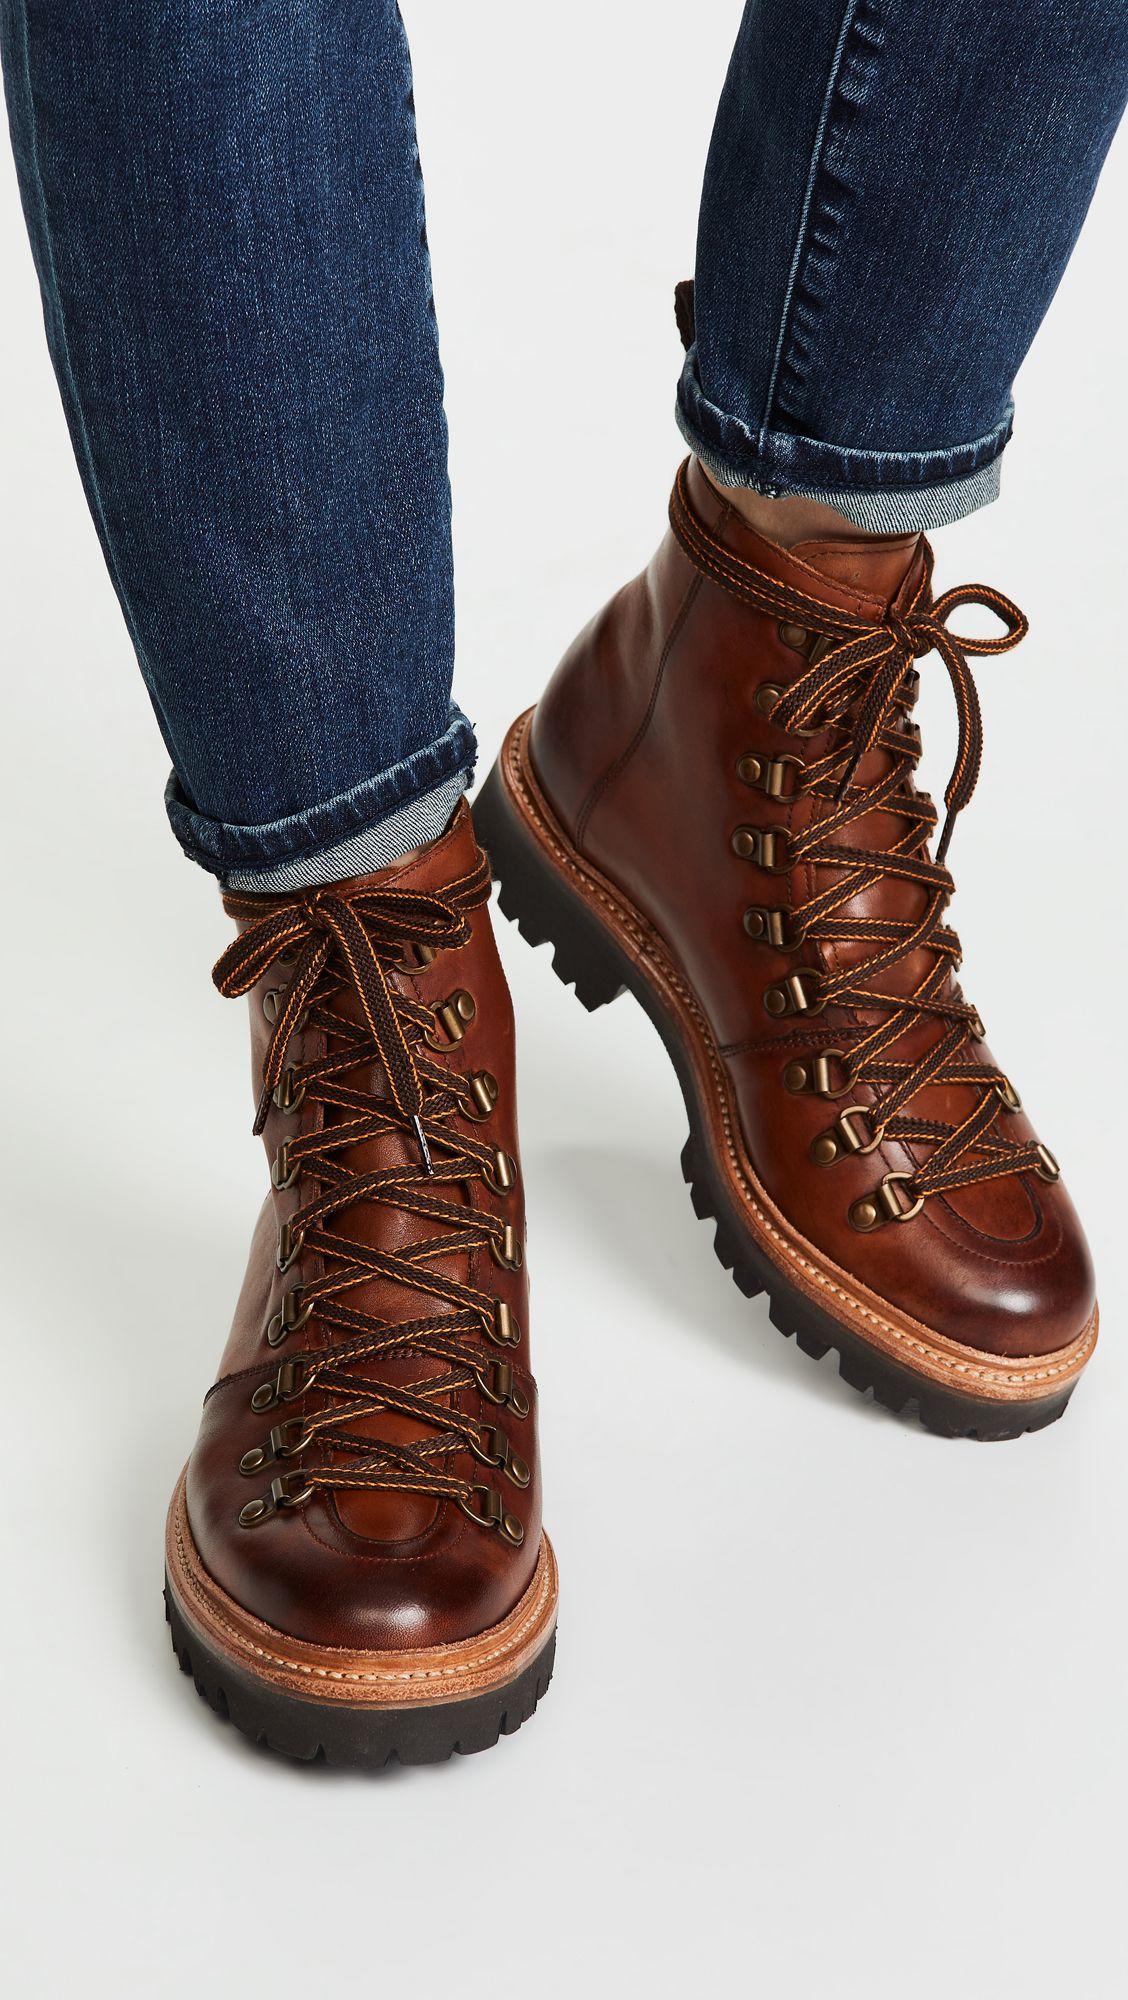 af61da28f77 Nanette Combat Boots in 2019 | Boots | Combat boots, Boots, Cool boots